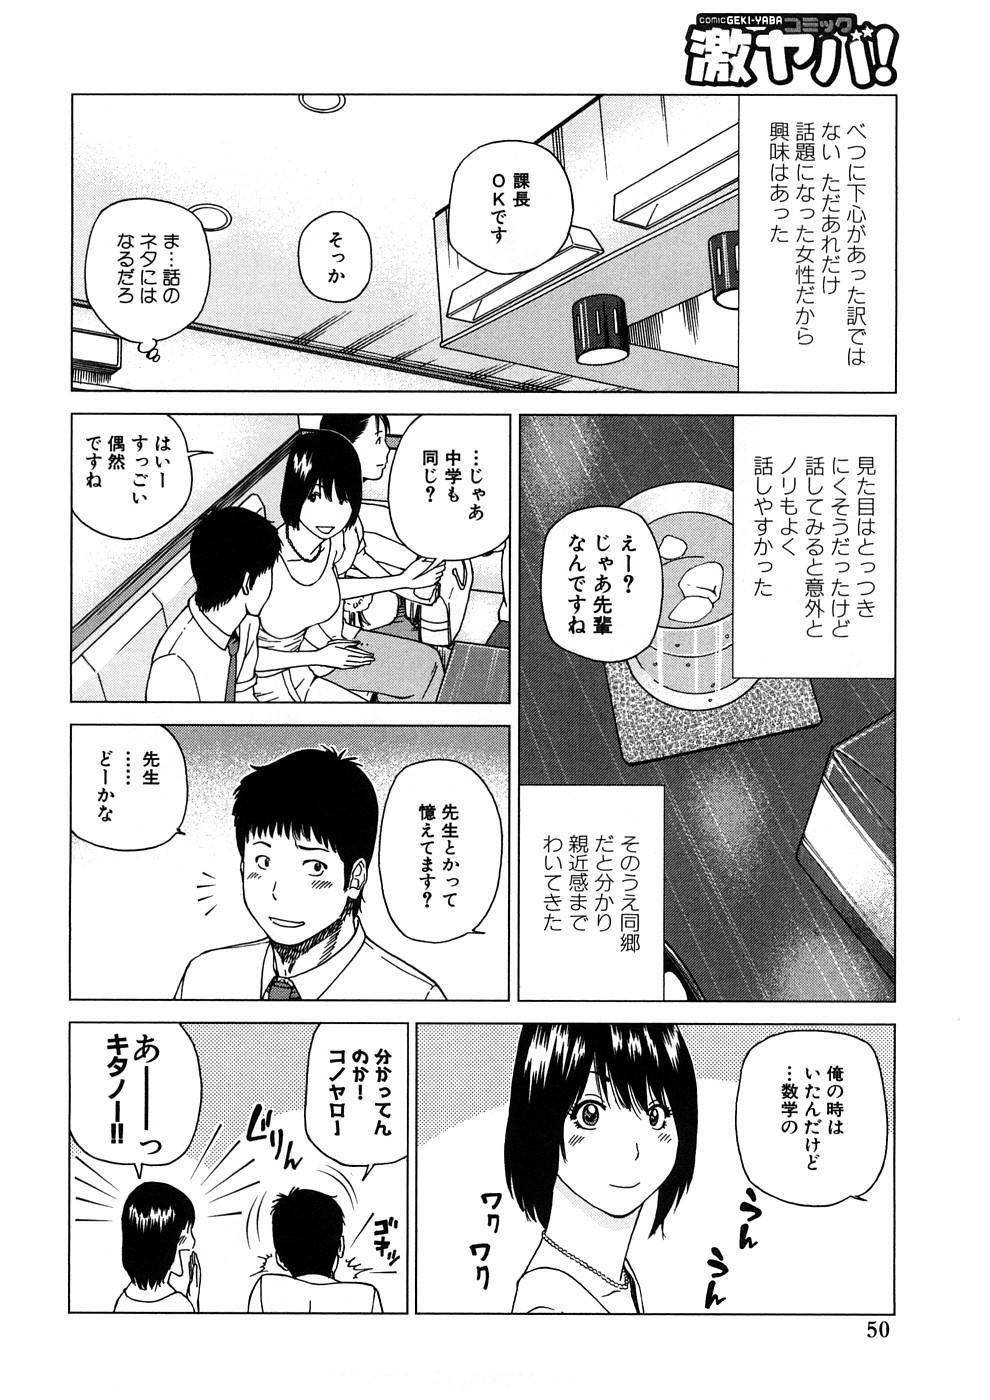 Geki Yaba Anthology Vol. 1 - Naka ni Dashite yo 50